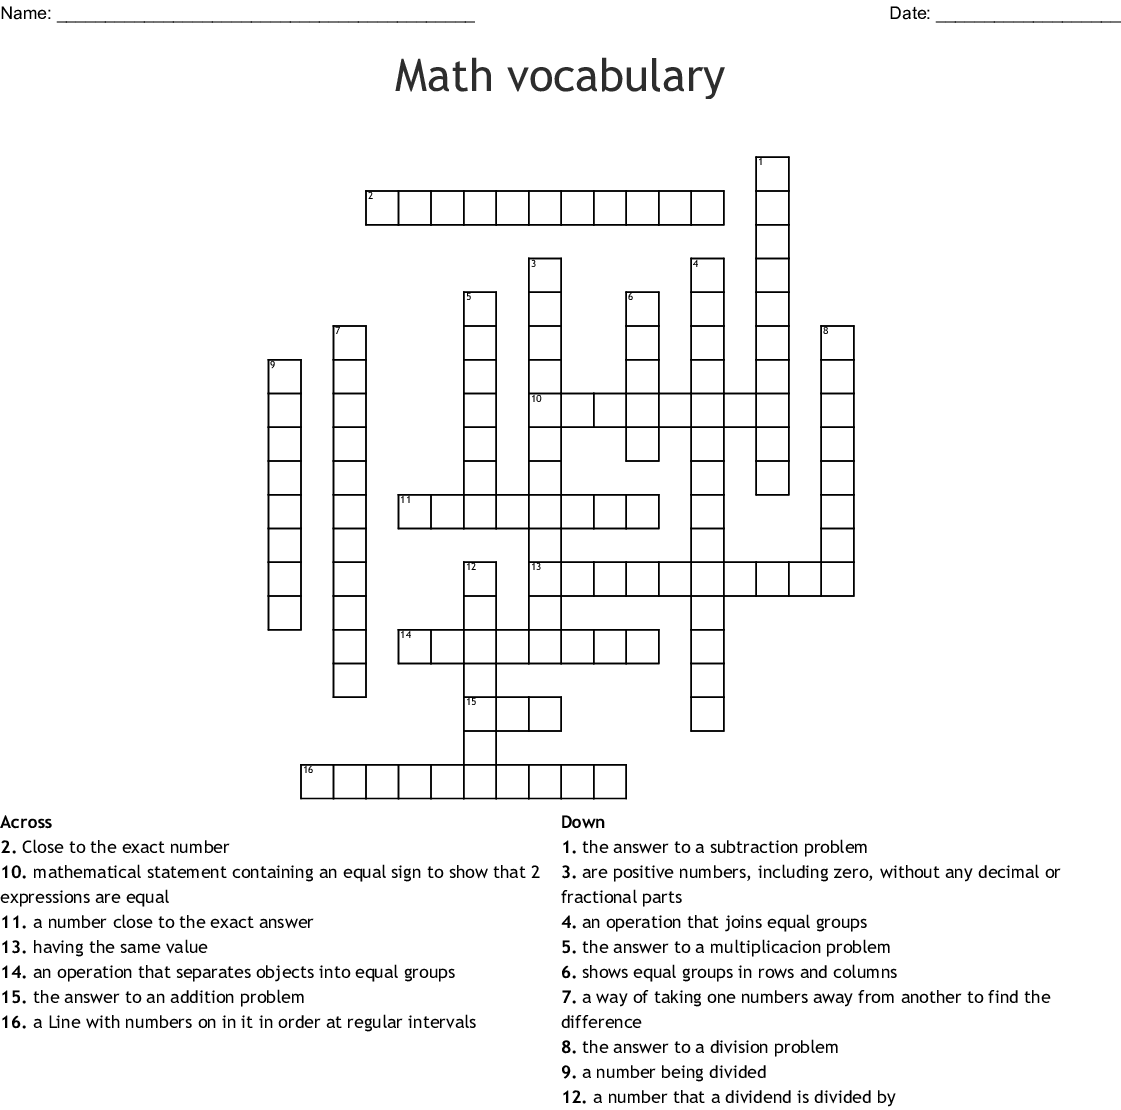 Similar To Math Vocabulary Crossword